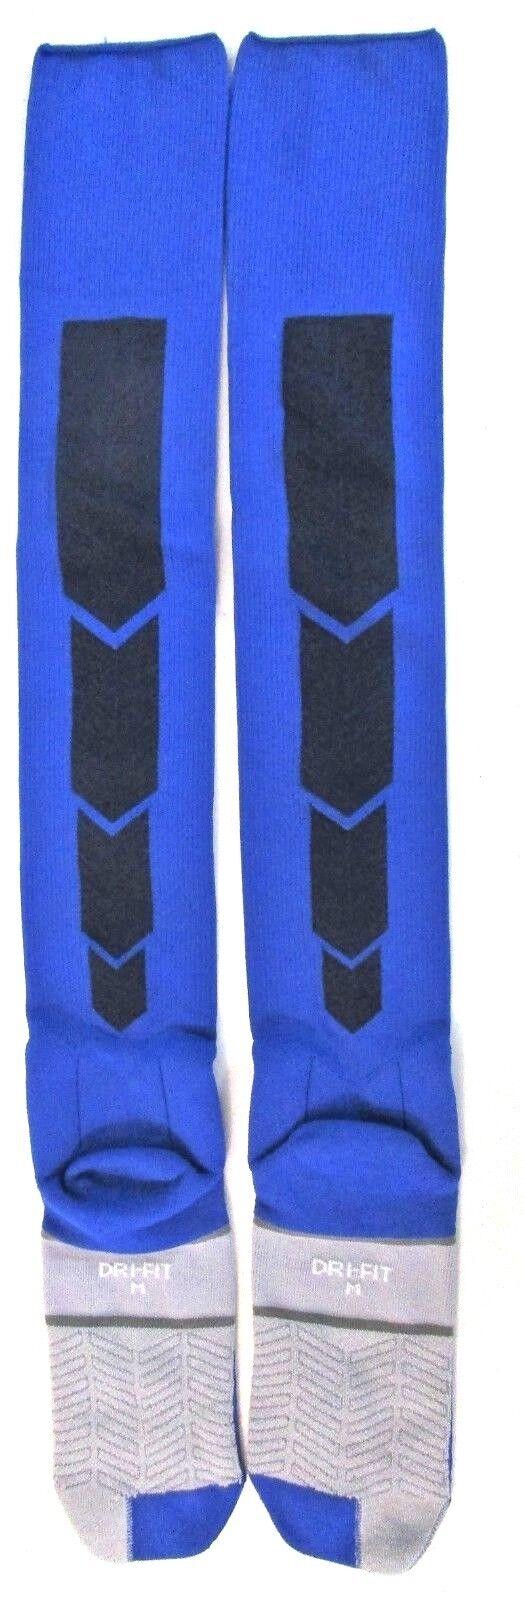 Nike XL Soccer SPORT Classic Socks Blue Gray BLK Cushioned a